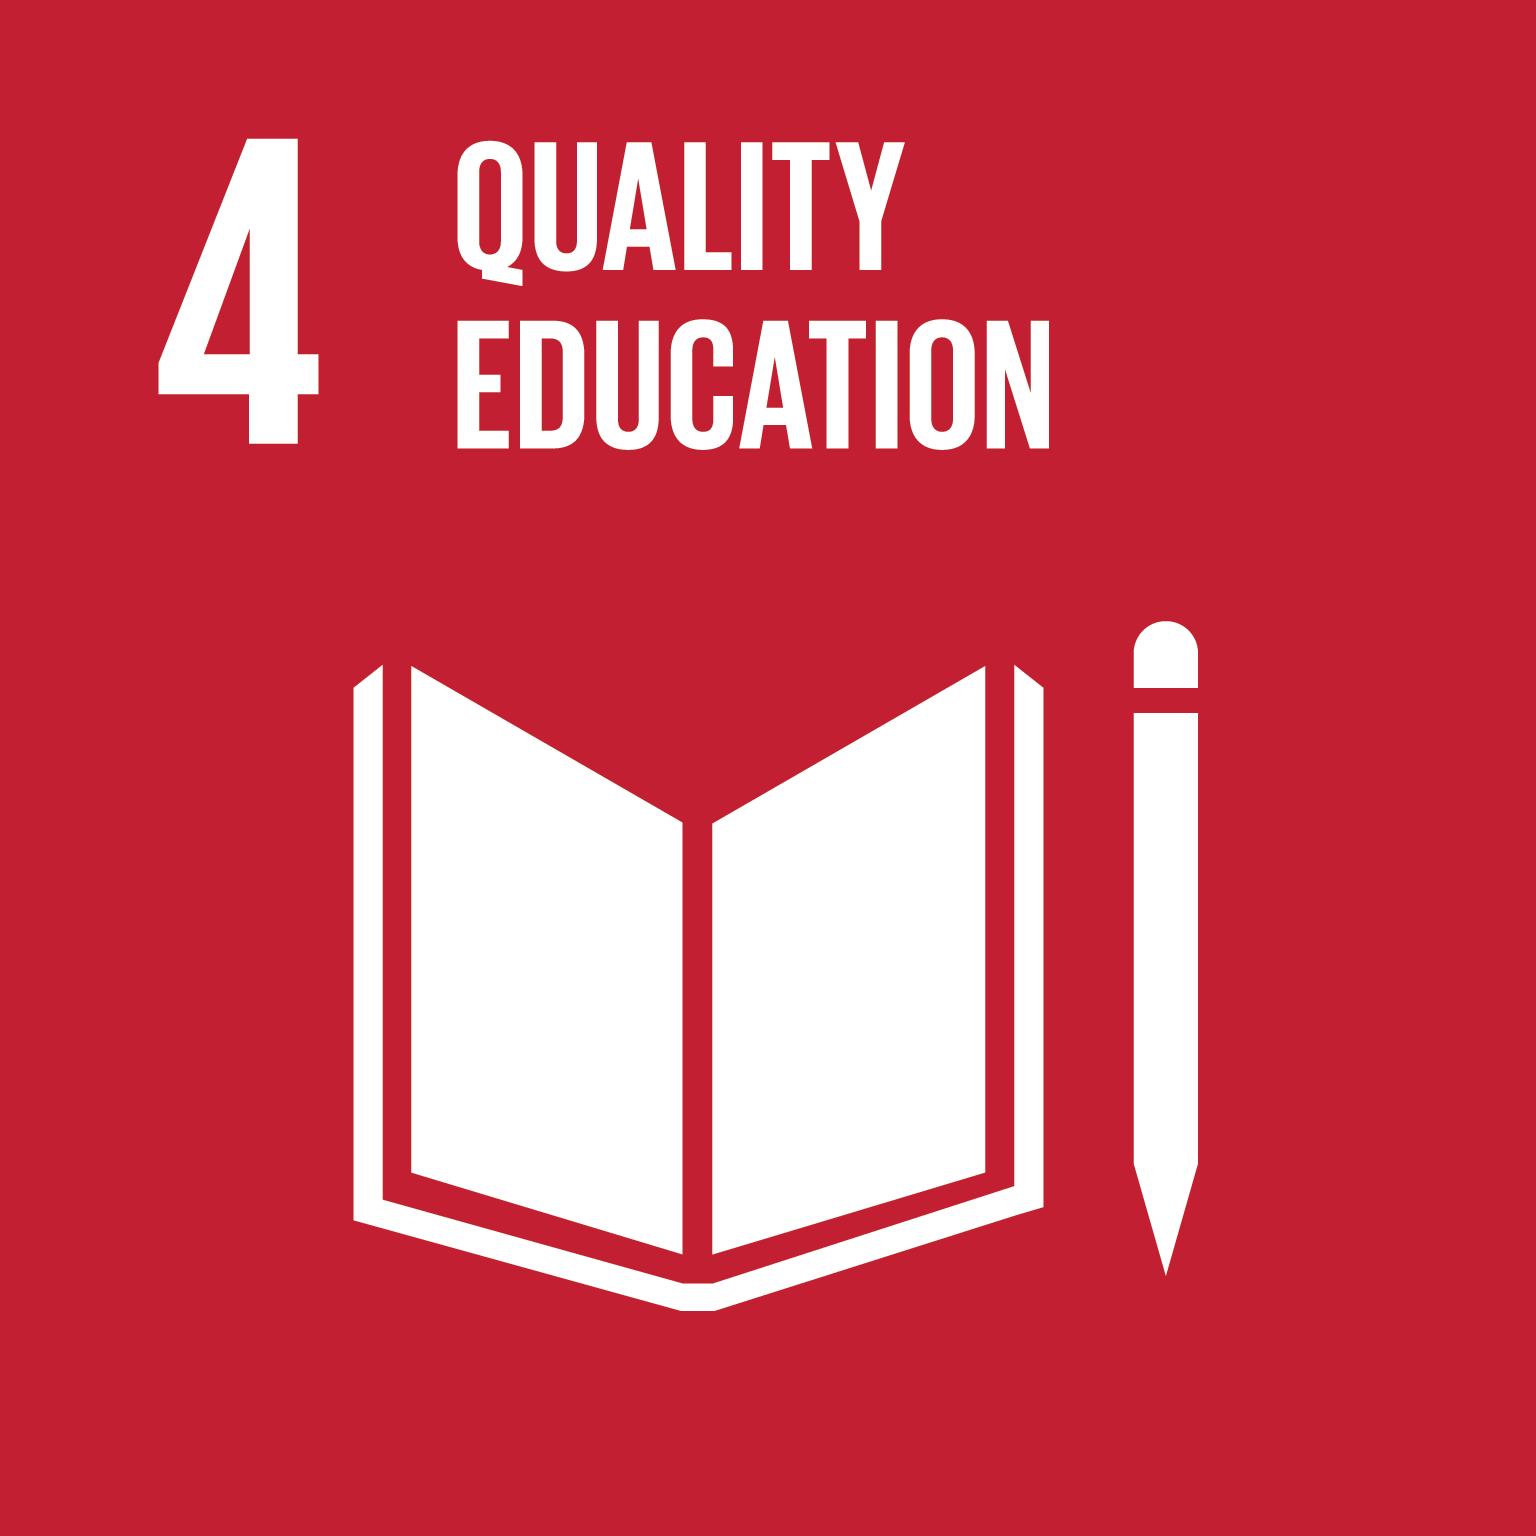 E_SDG goals_icons-individual-rgb-04.png